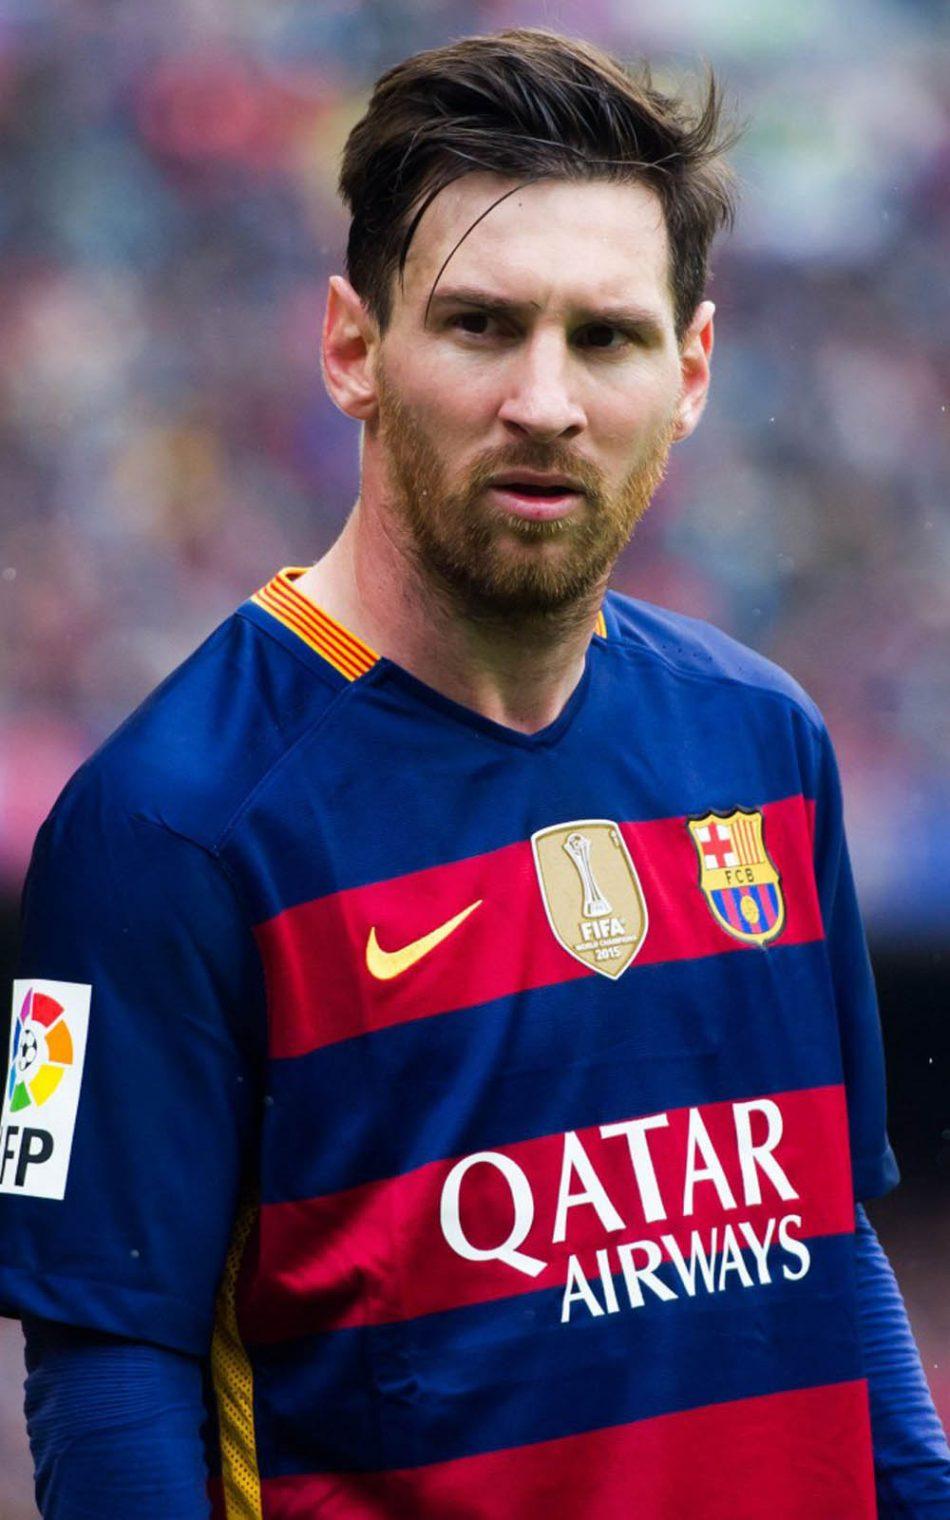 Lionel Messi FC Barcelona Moment 4K Ultra HD Mobile Wallpaper 950x1520